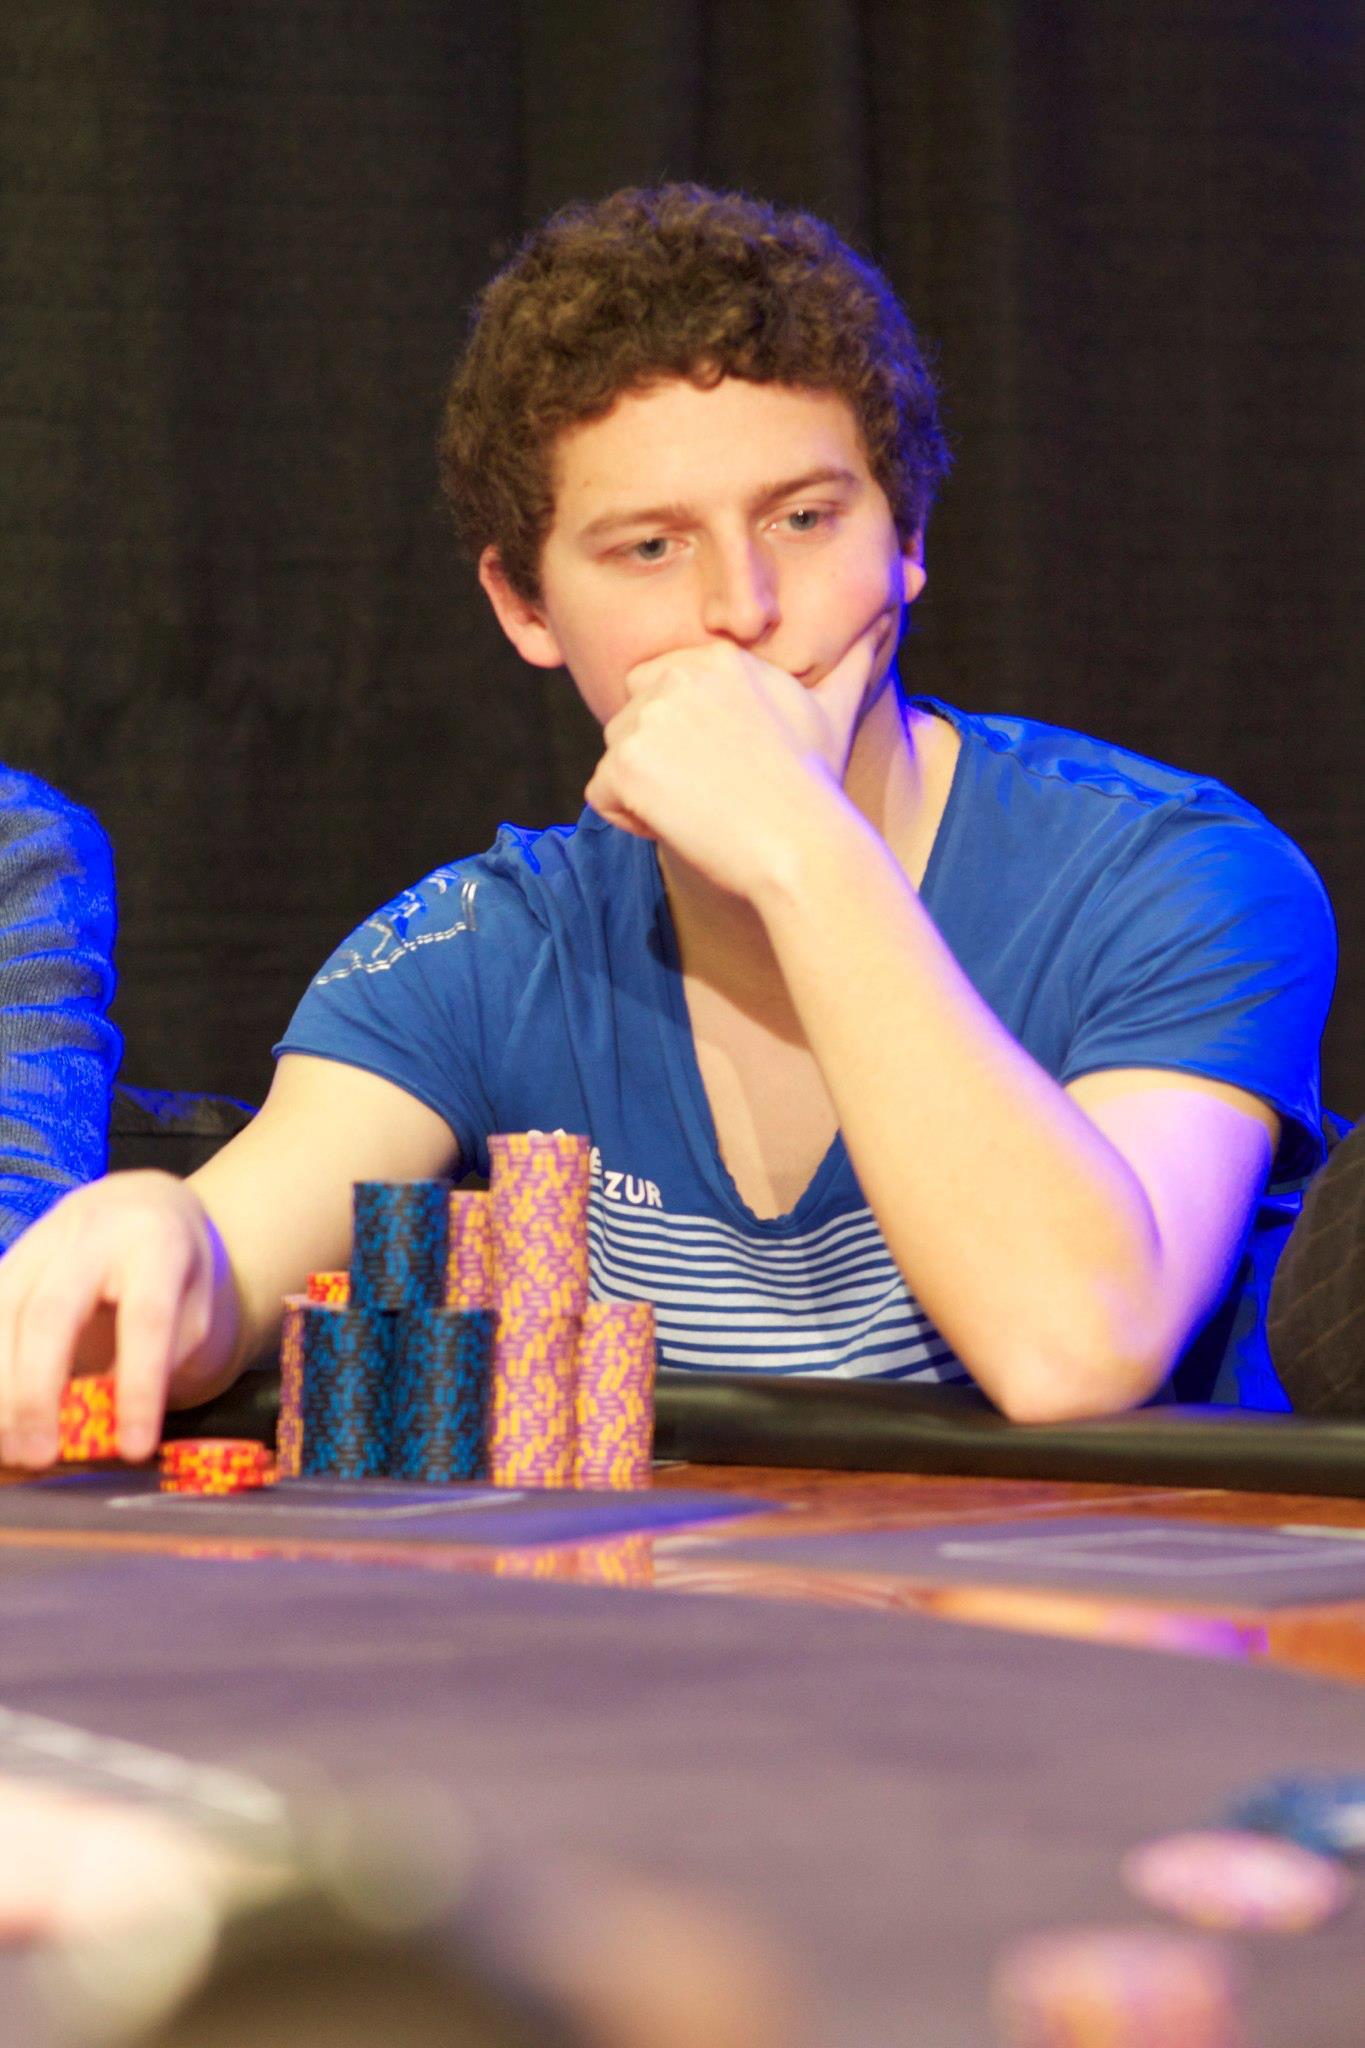 Poker routines episode #9: Daniel Carter